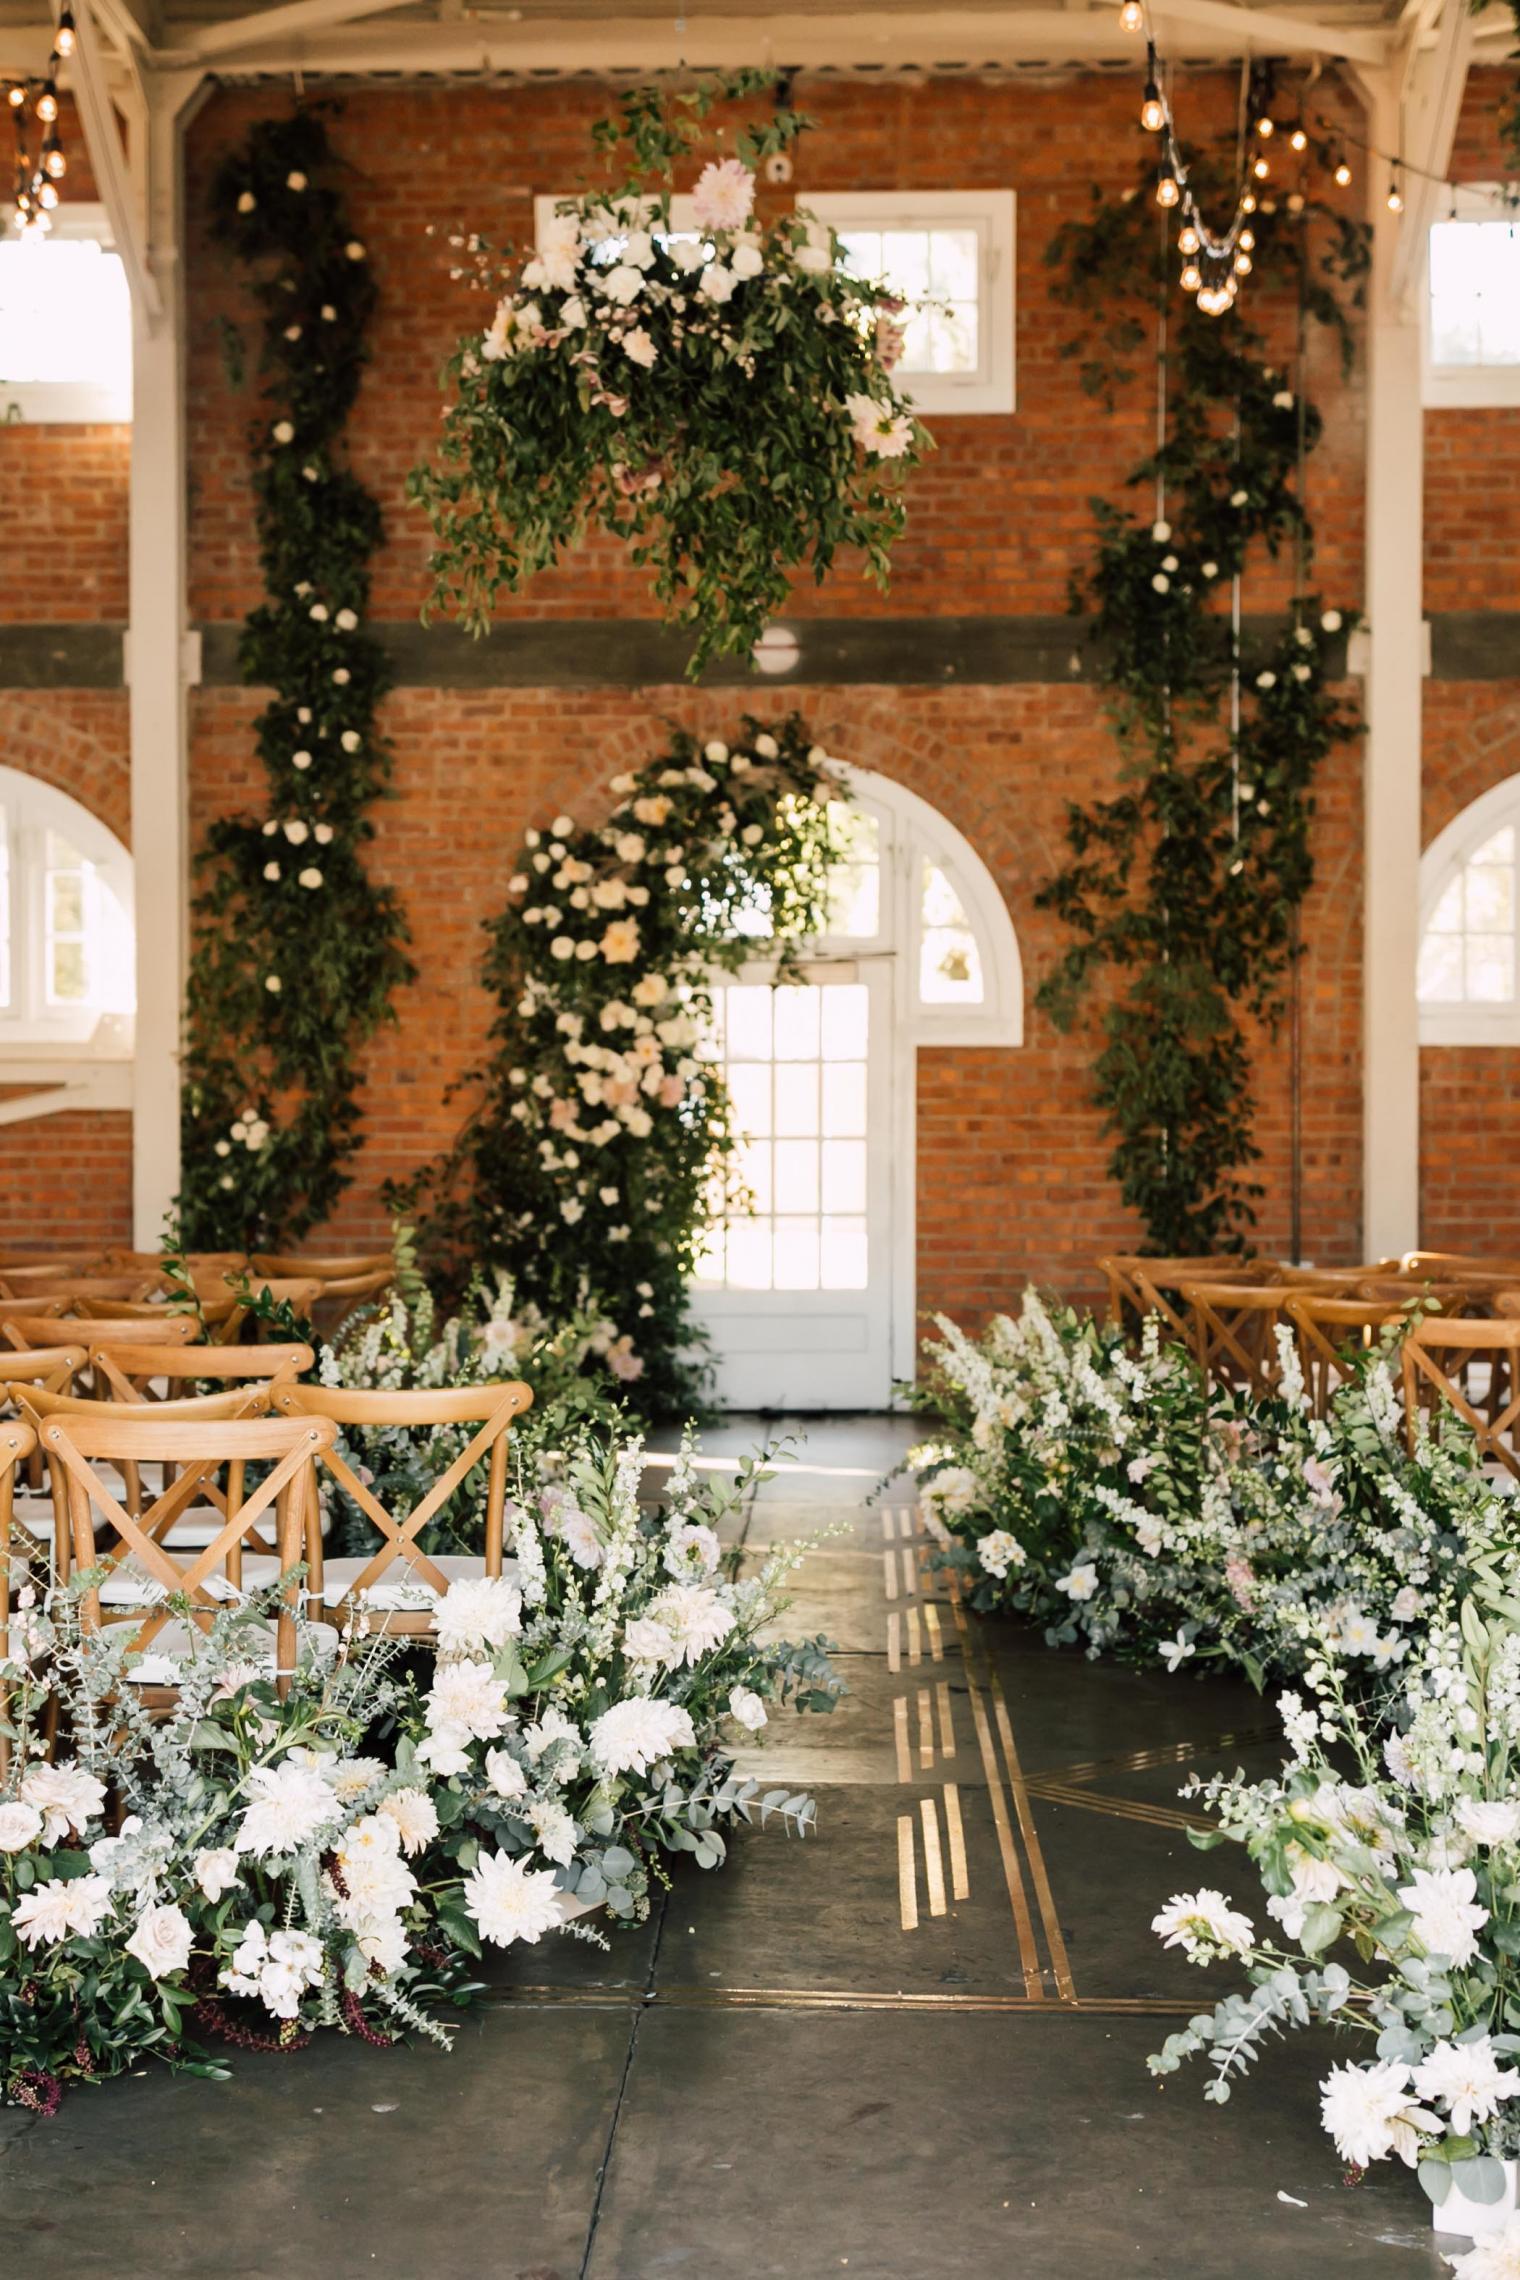 Top Wedding Venues in San Diego, California